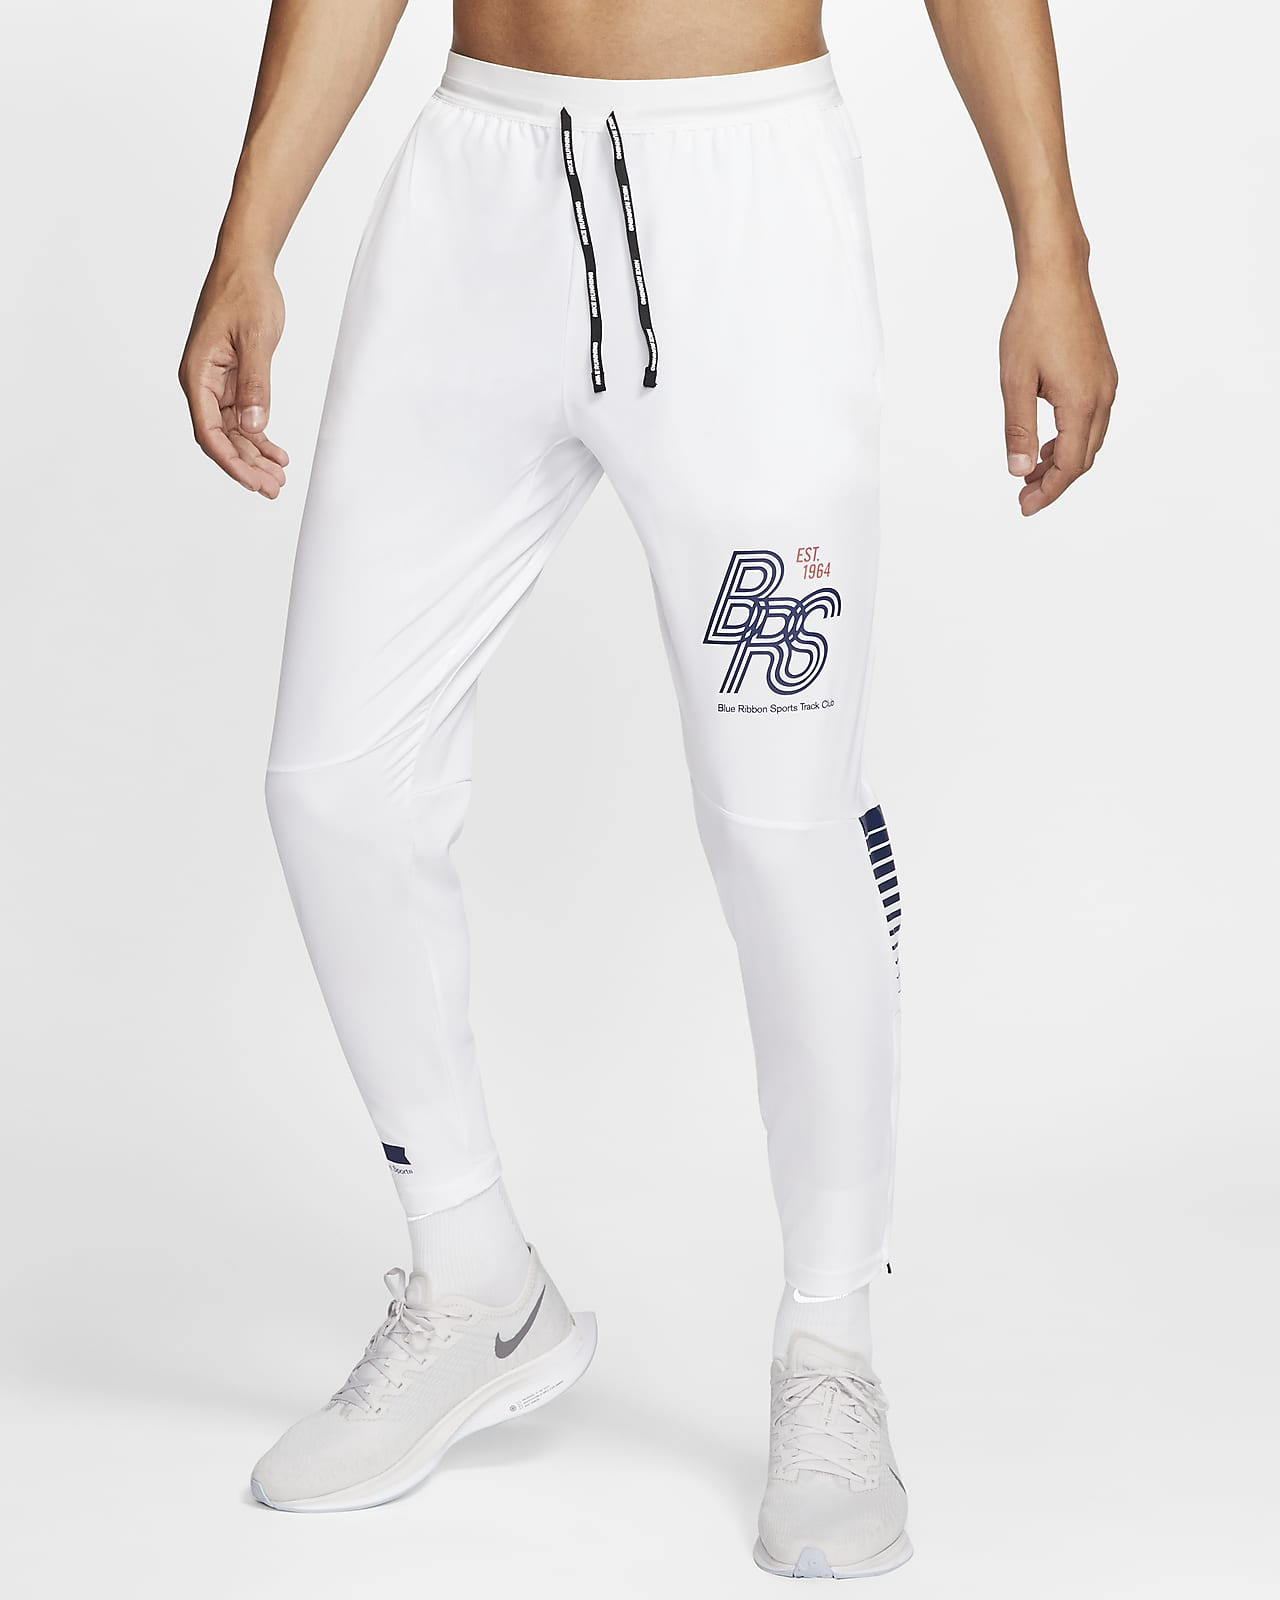 Cuadrante en voz alta Rechazado  Pantalon de running Nike Blue Ribbon Sports. Nike CH